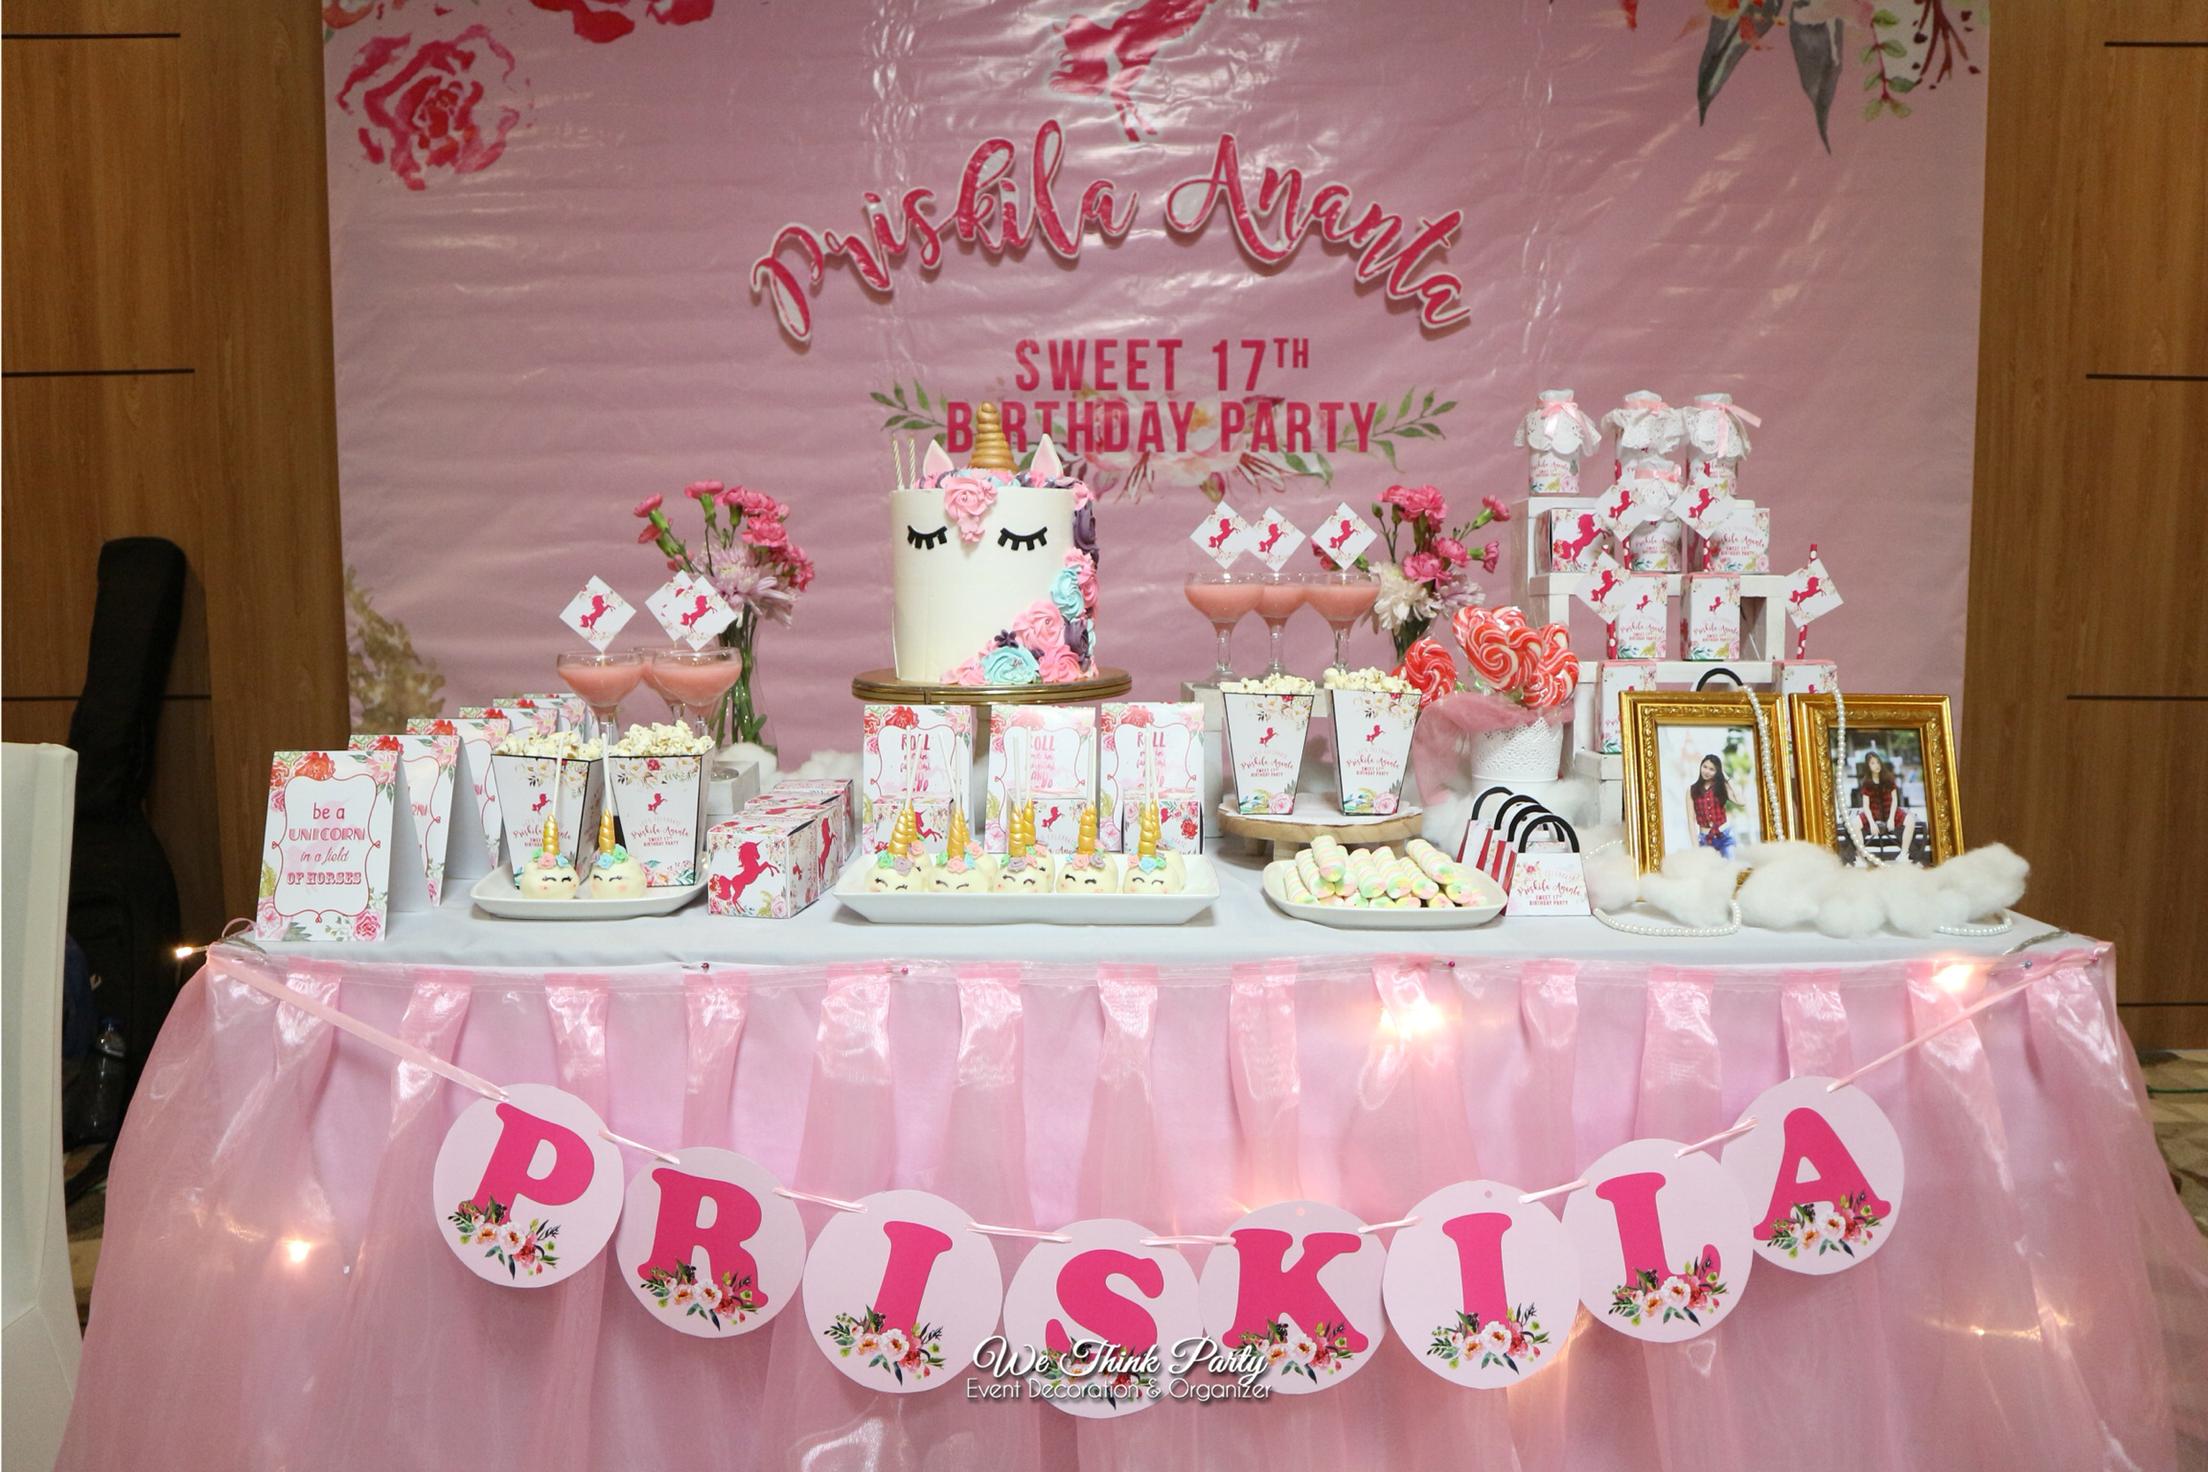 Unicorn Dessert Table by We Think Party | Bridestory.com